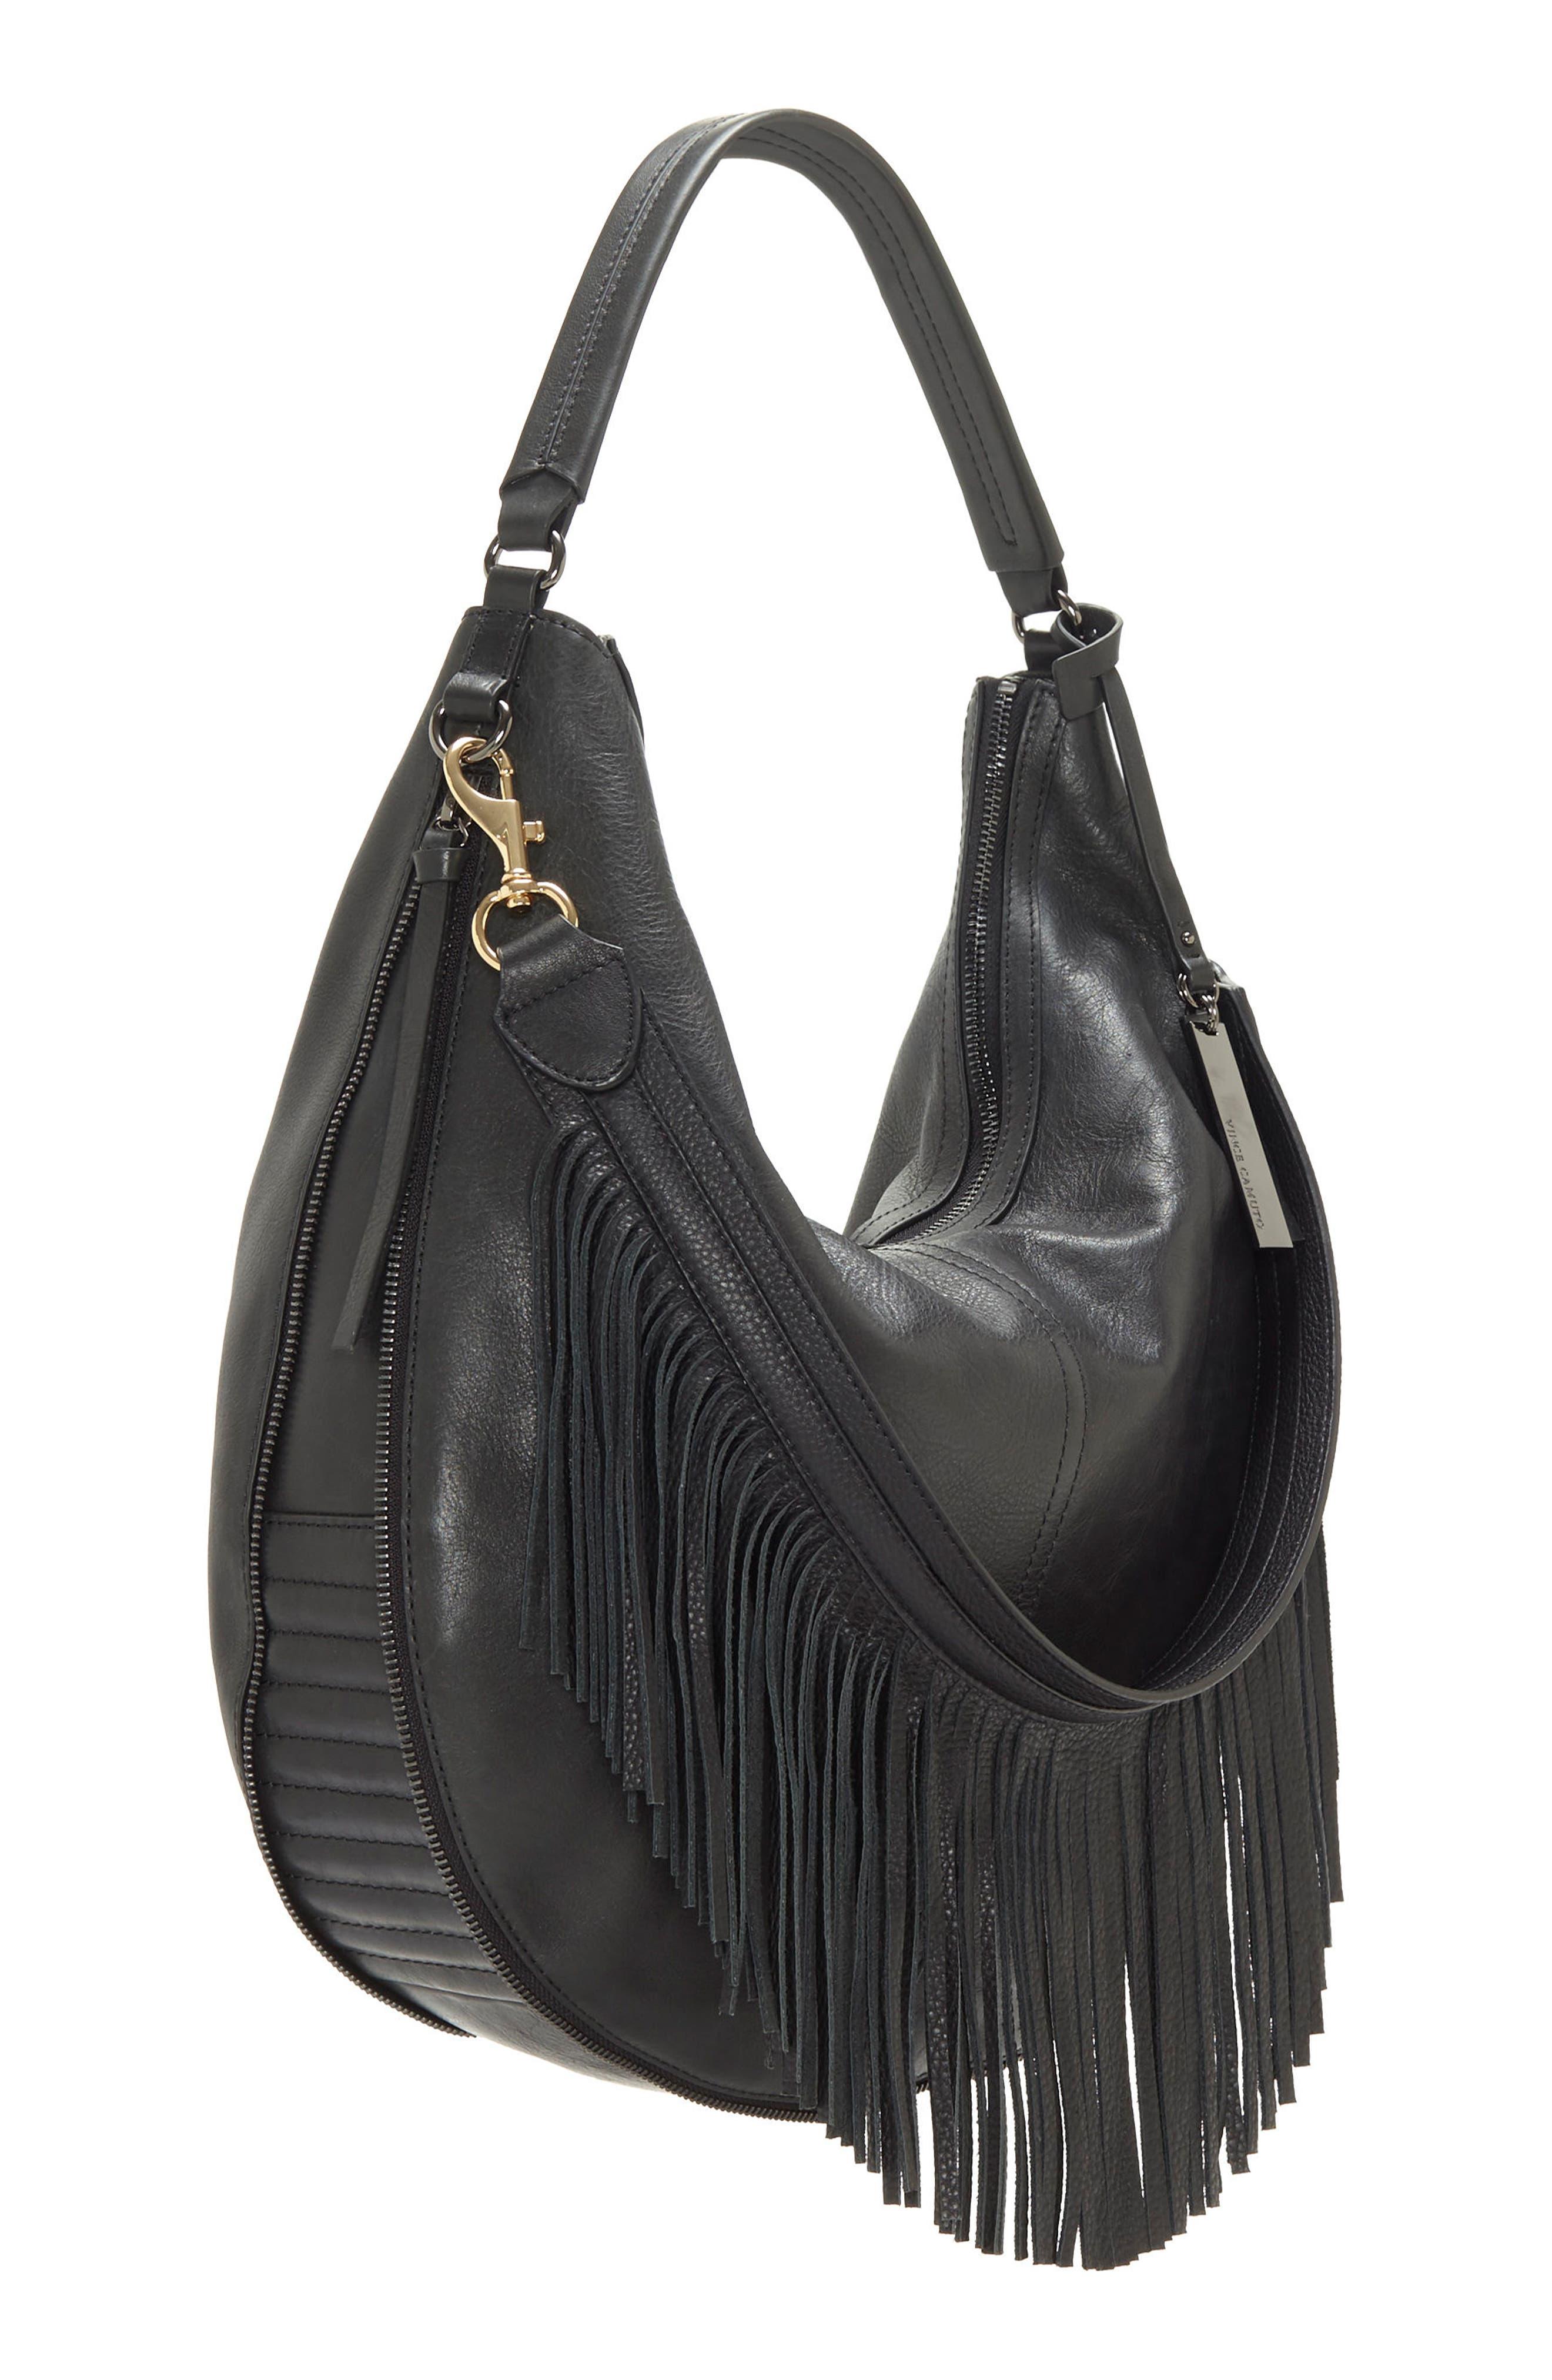 Hil Leather Hobo Bag,                             Alternate thumbnail 4, color,                             002